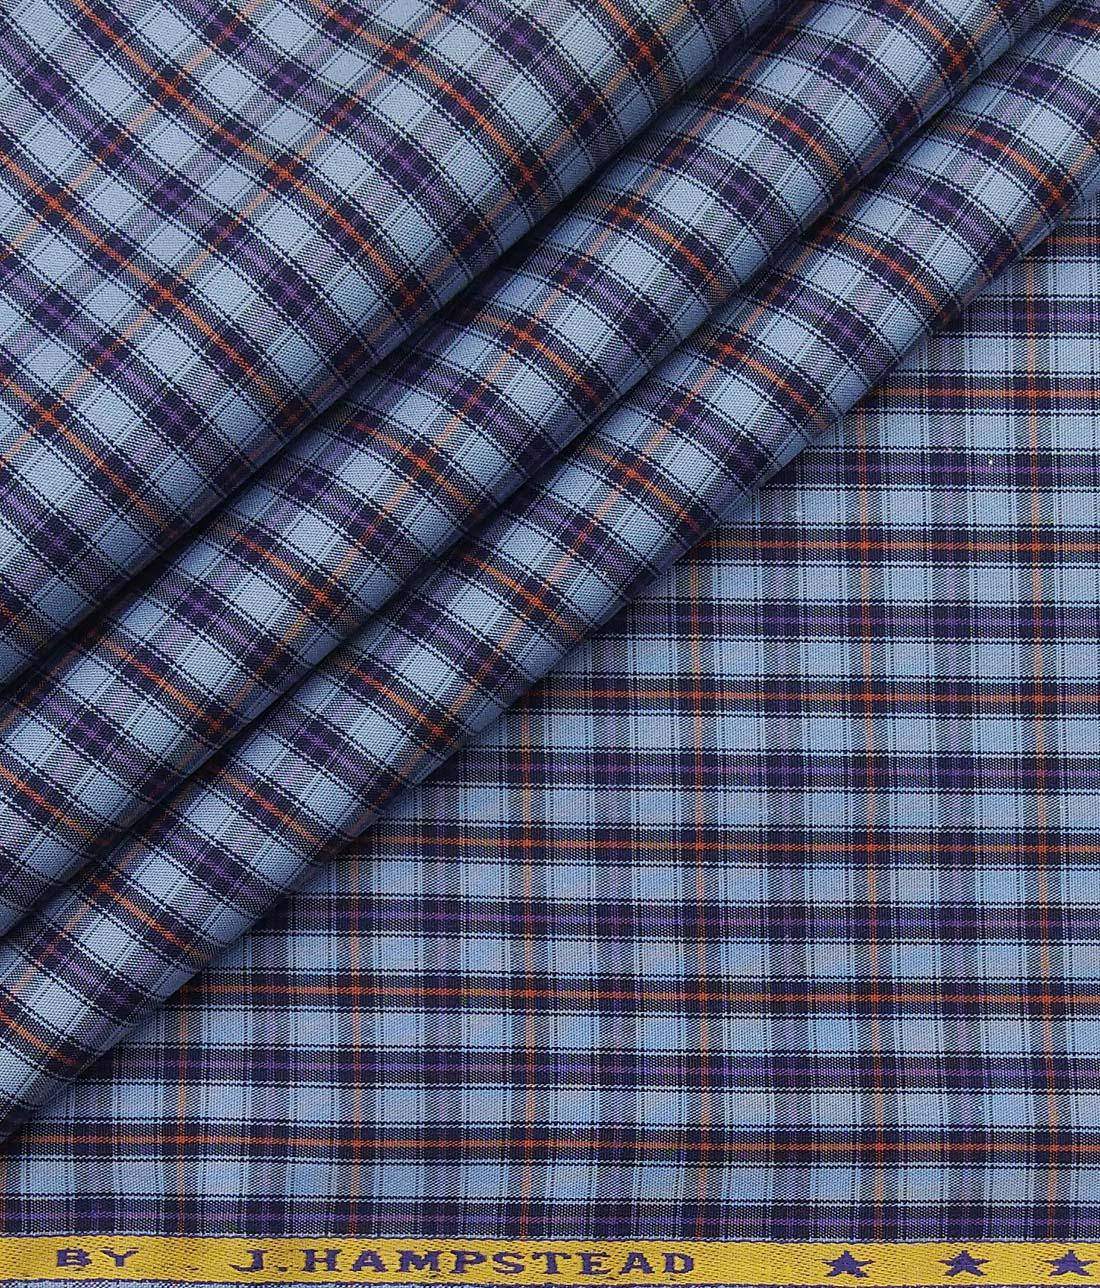 4e7cb950ddd J.Hampstead Italy by Siyaram's Light Blue 100% Giza Cotton Multicolor  Checks Shirt Fabric (1.60 M)